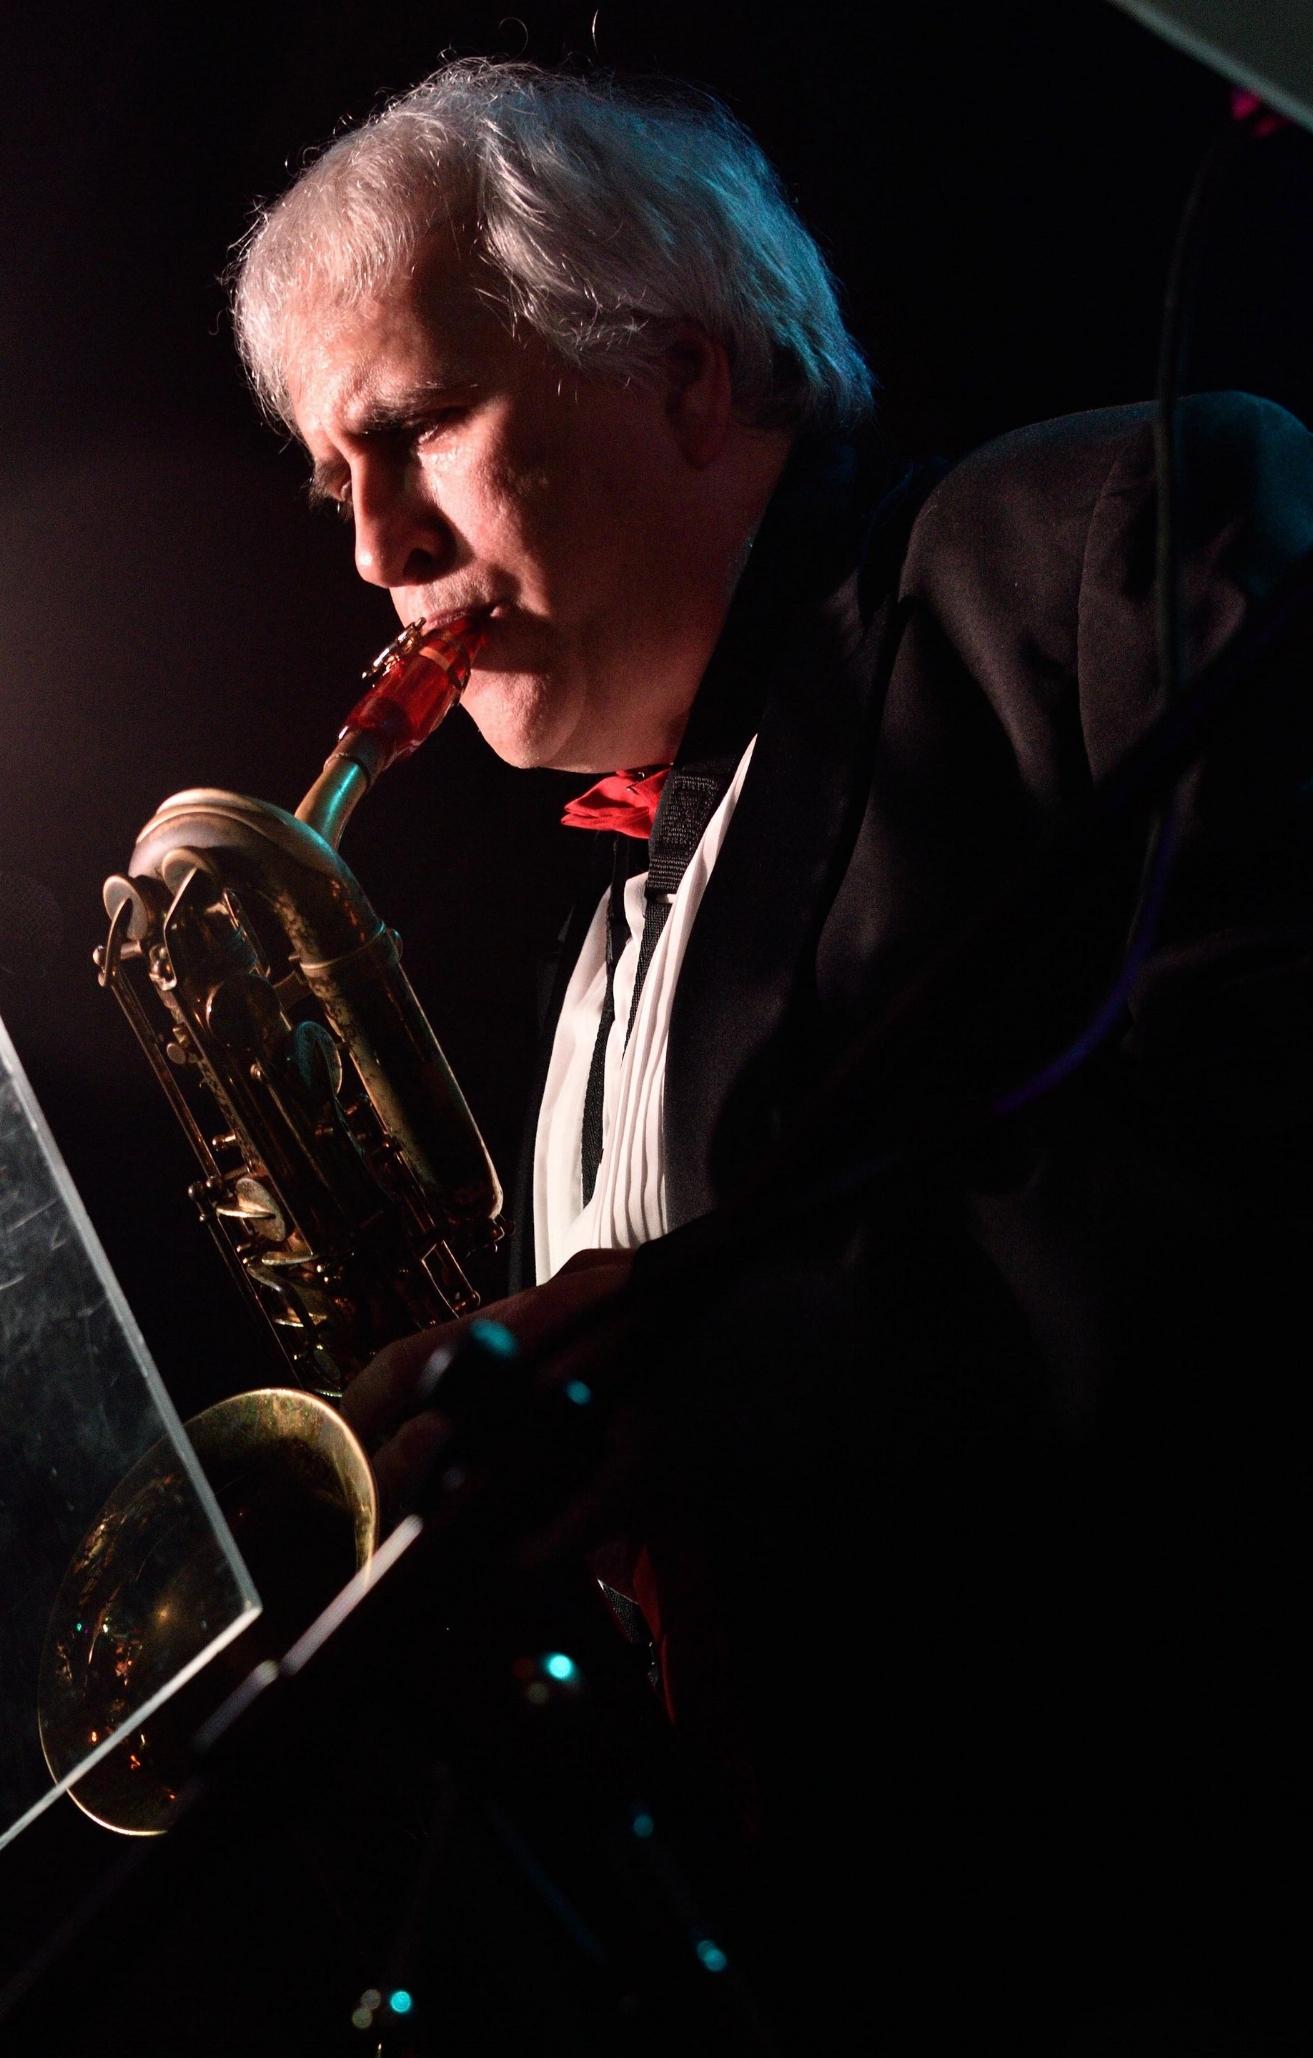 Bruce Giles - Baritone Sax